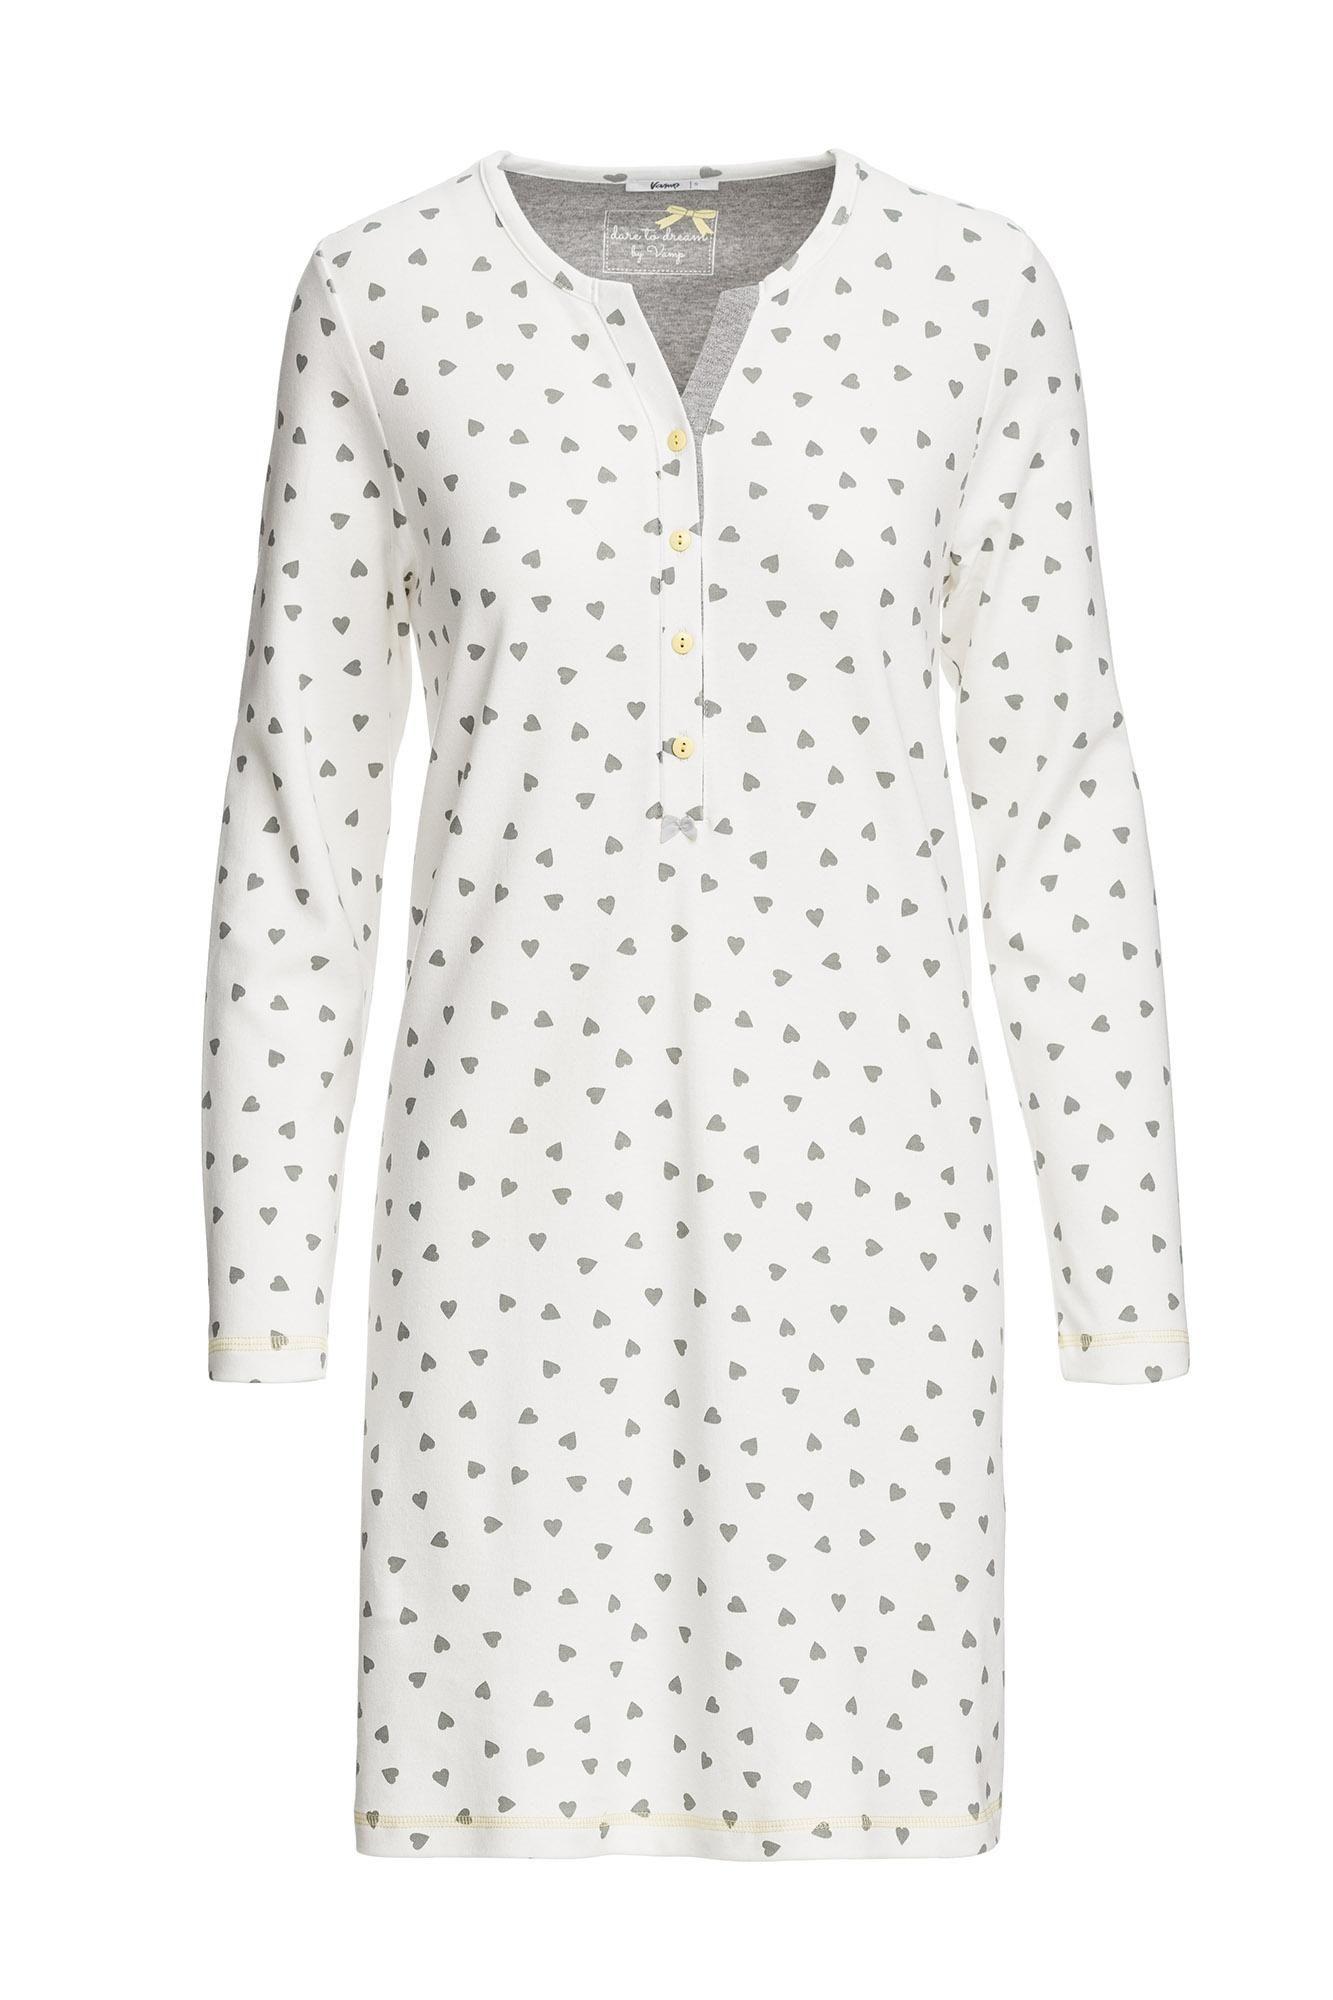 Women's Patterned Nursing Nightgown Plus Size